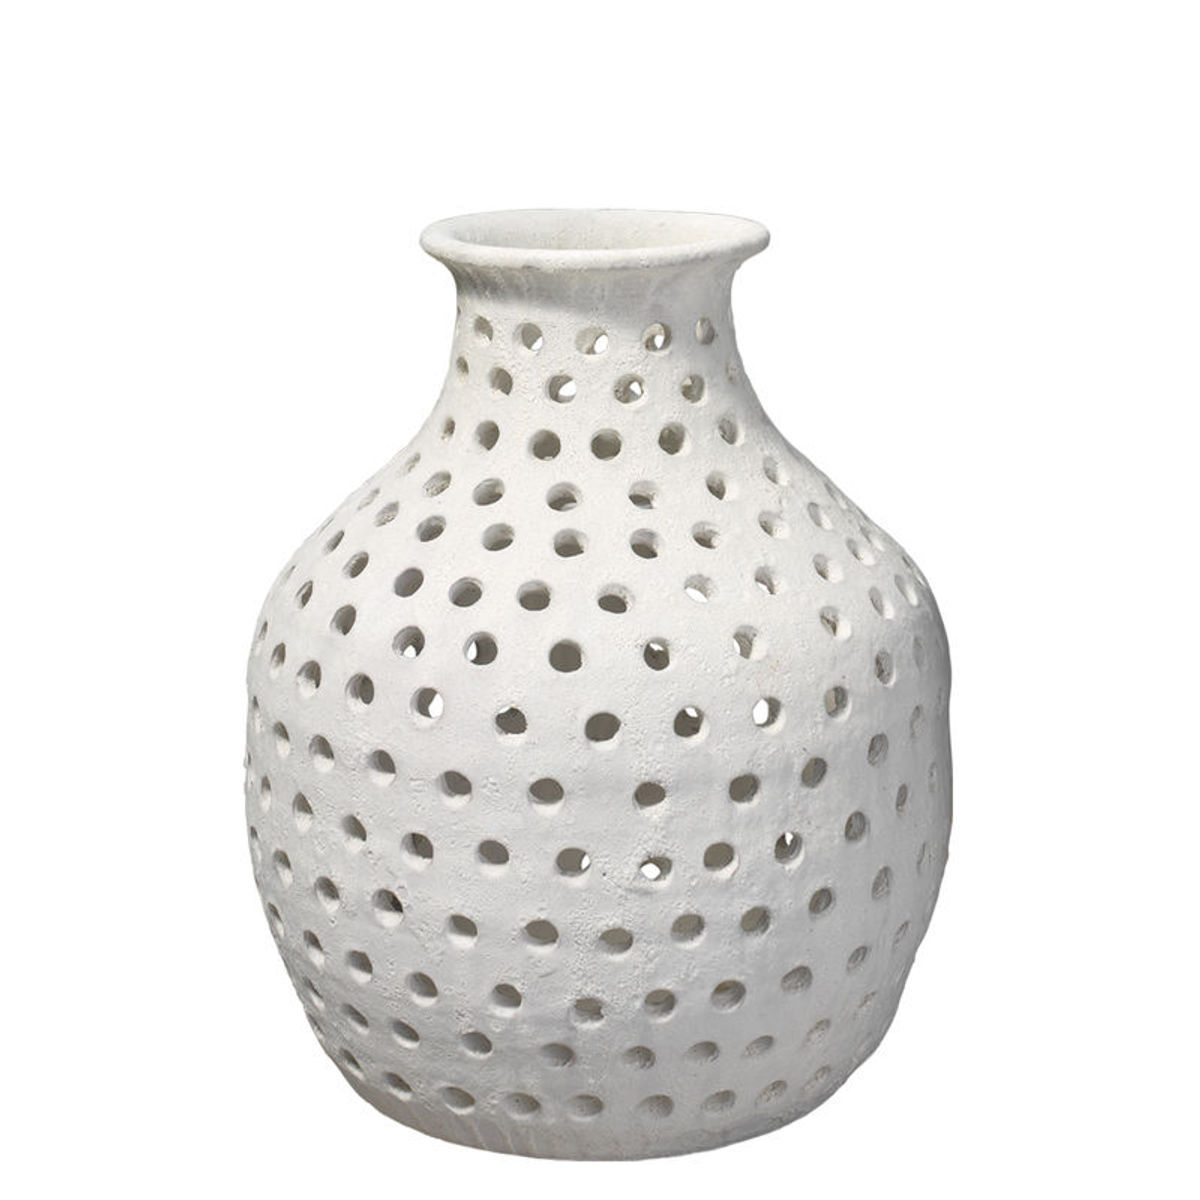 Small Porous Vase In Matte White Ceramic